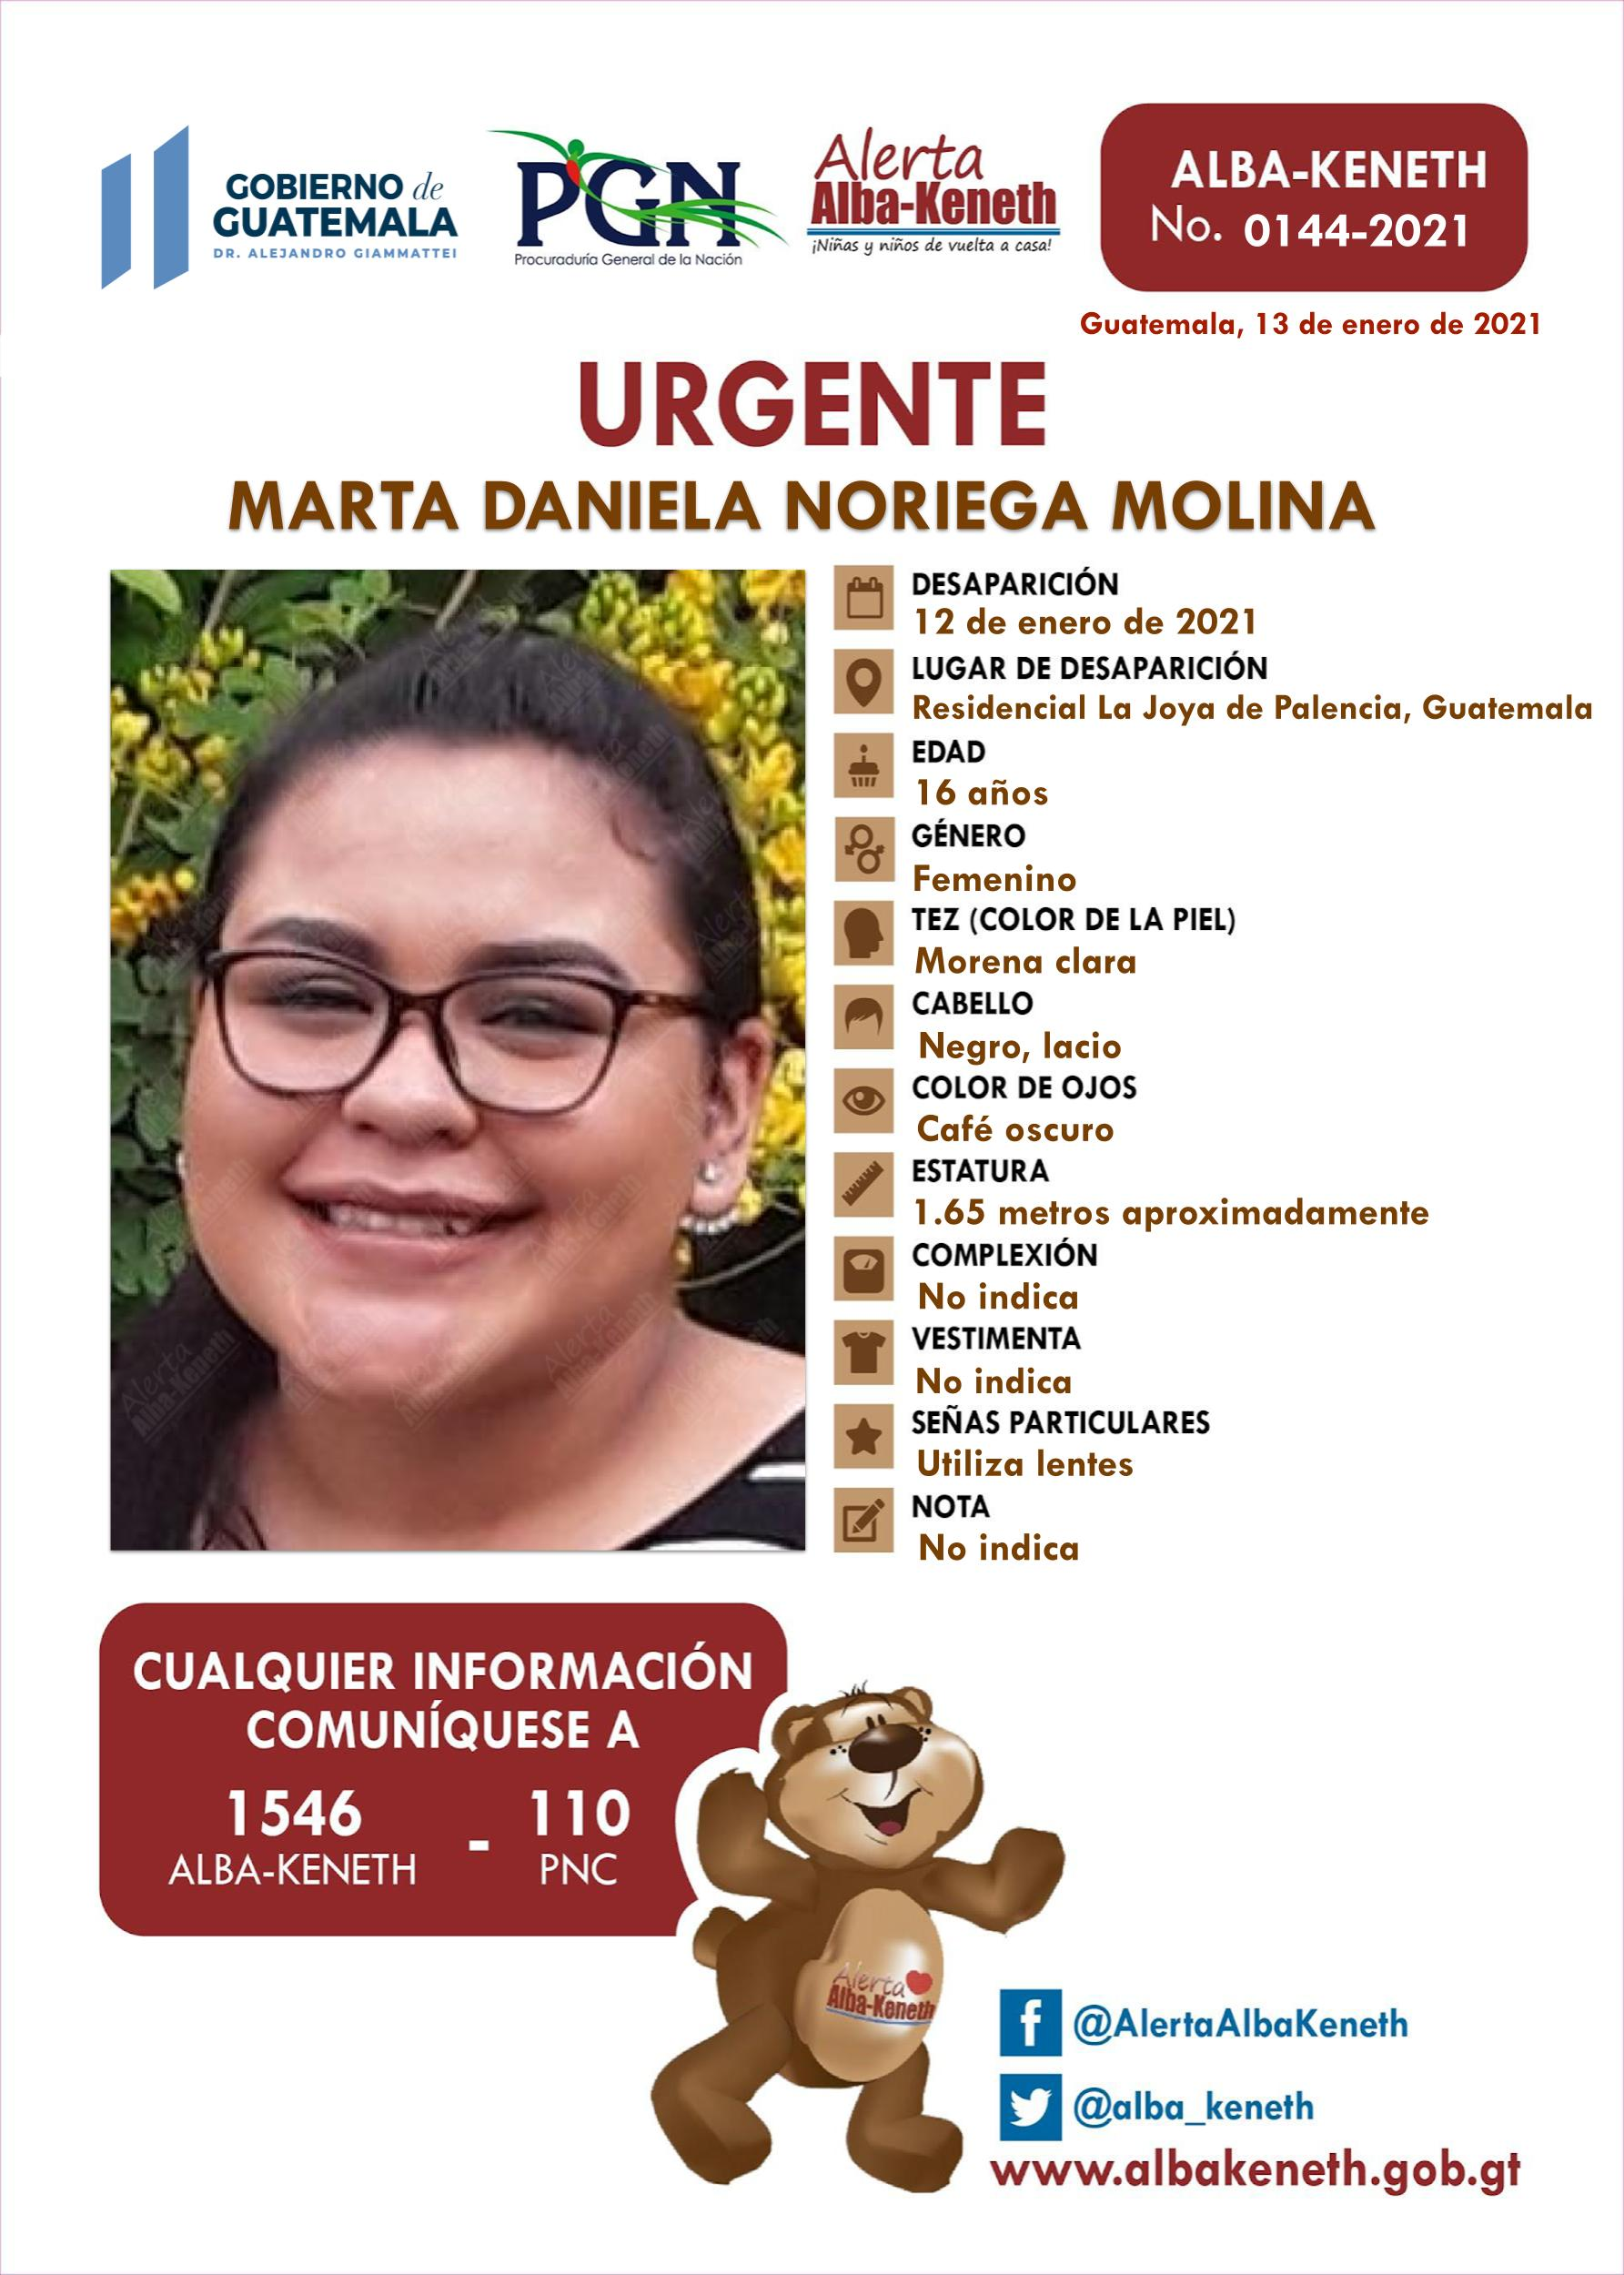 Marta Daniela Noriega Molina